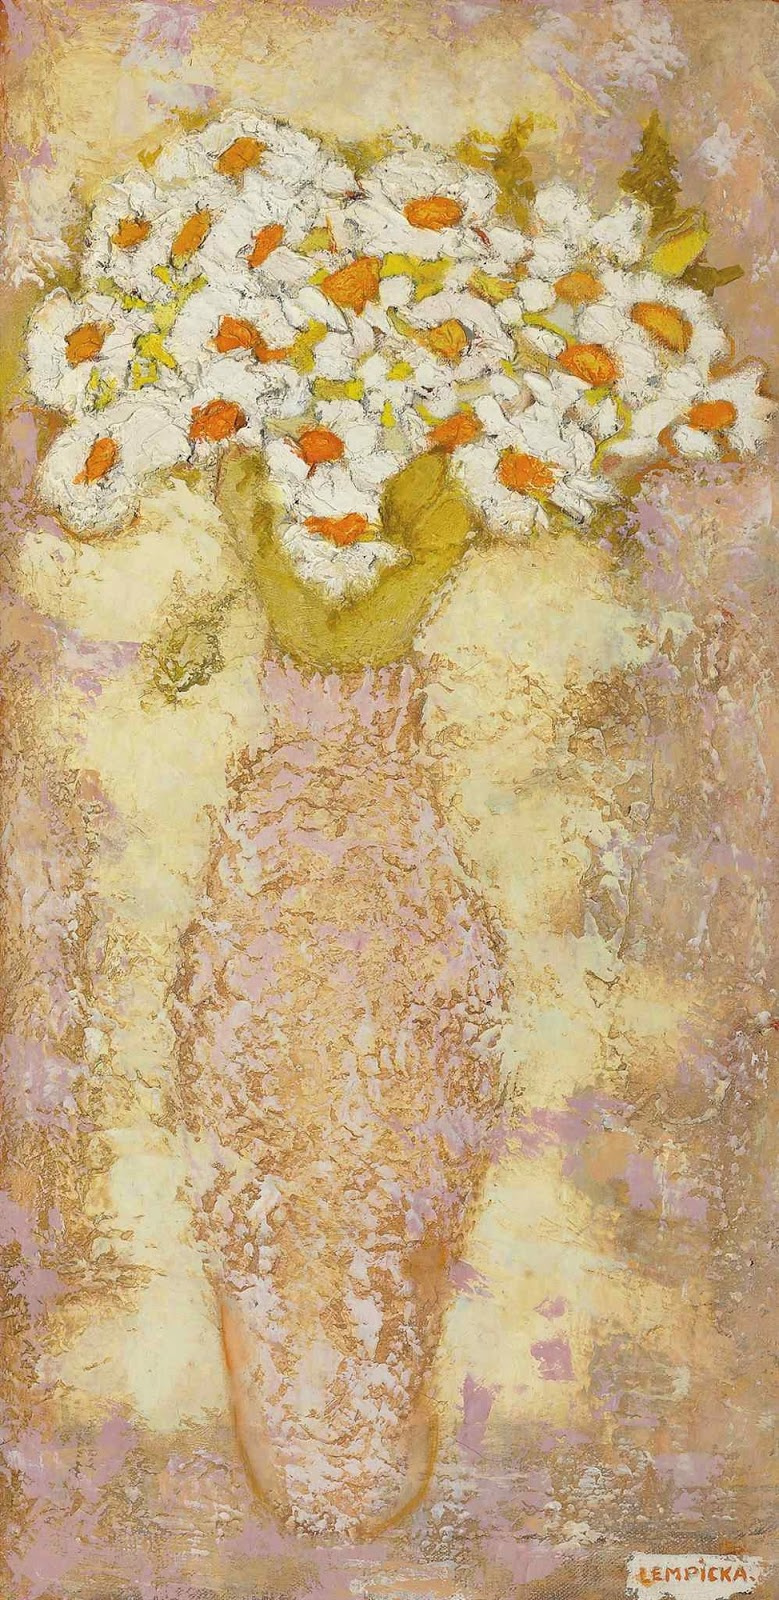 Tamara Lempicka. Daisies in a vase